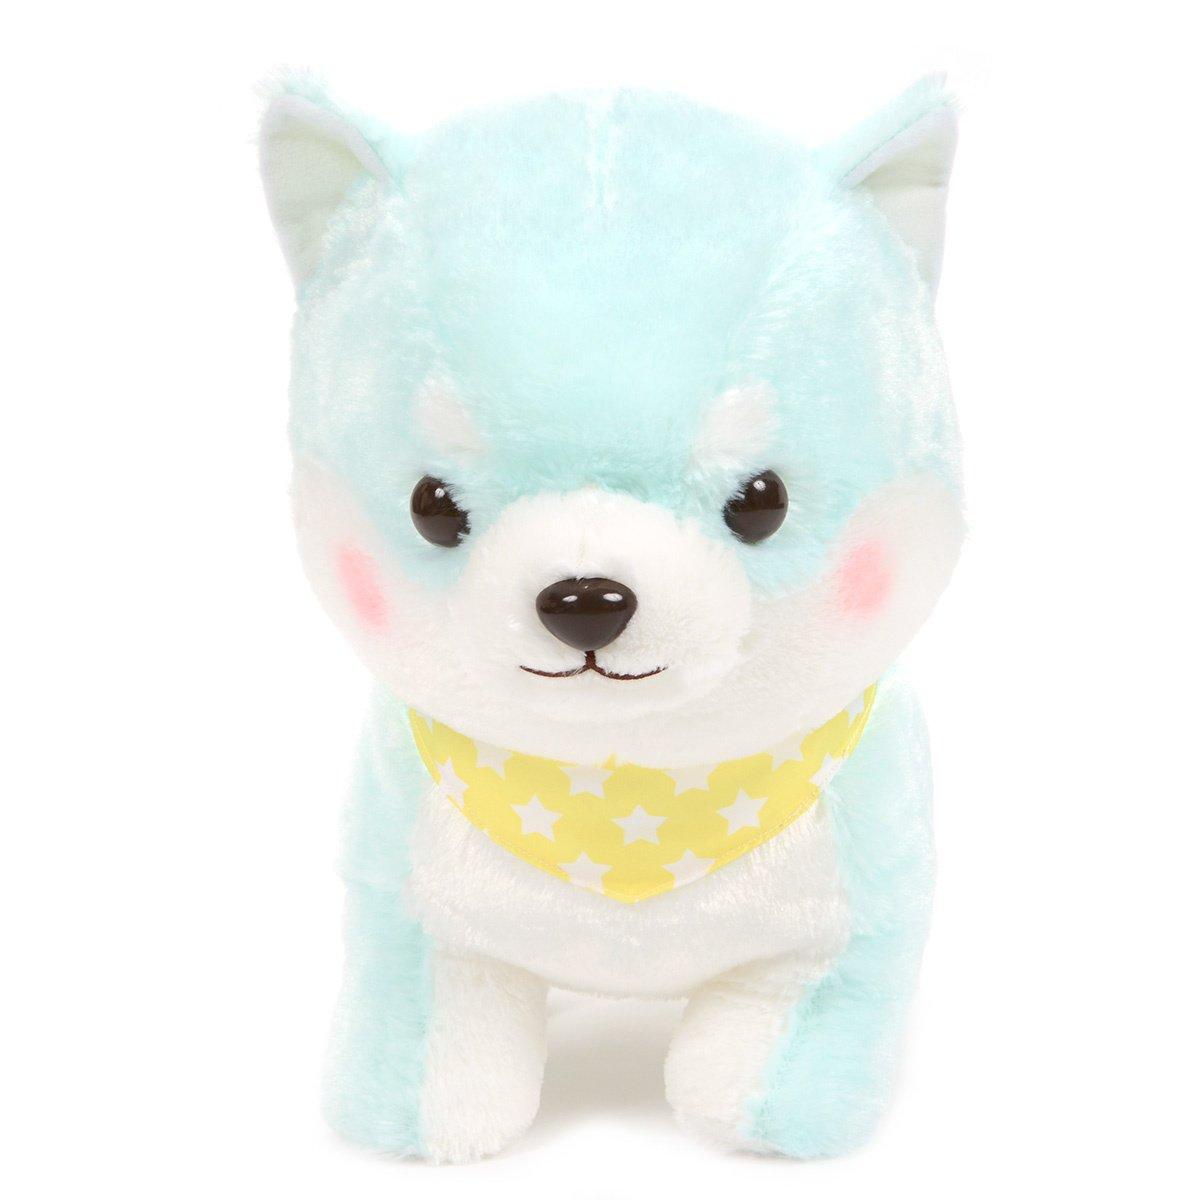 Amuse Dog Plushie, Mameshiba San Kyodai Funwari Yume no Kuni Taiga Pastel Green 15 Inches BIG Size